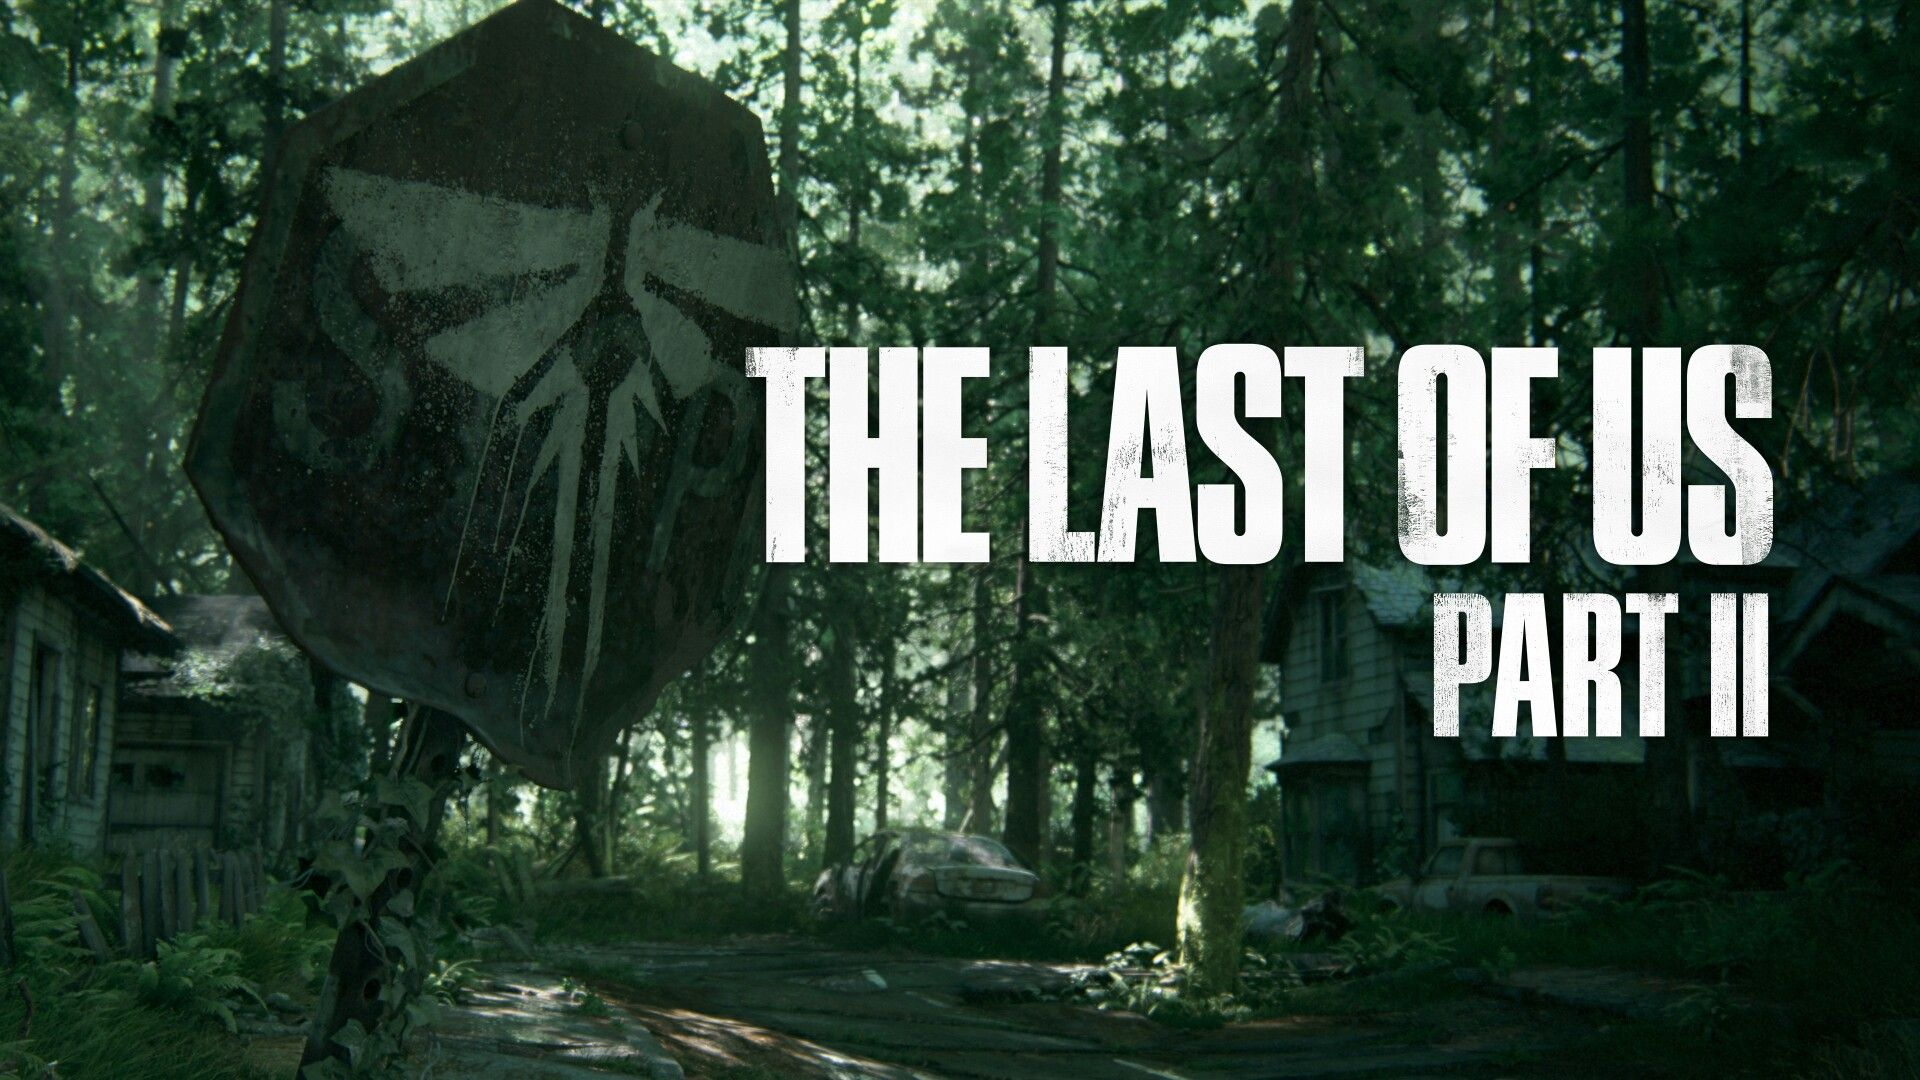 The Last Of Us: Part II - 4K HD Wallpaper